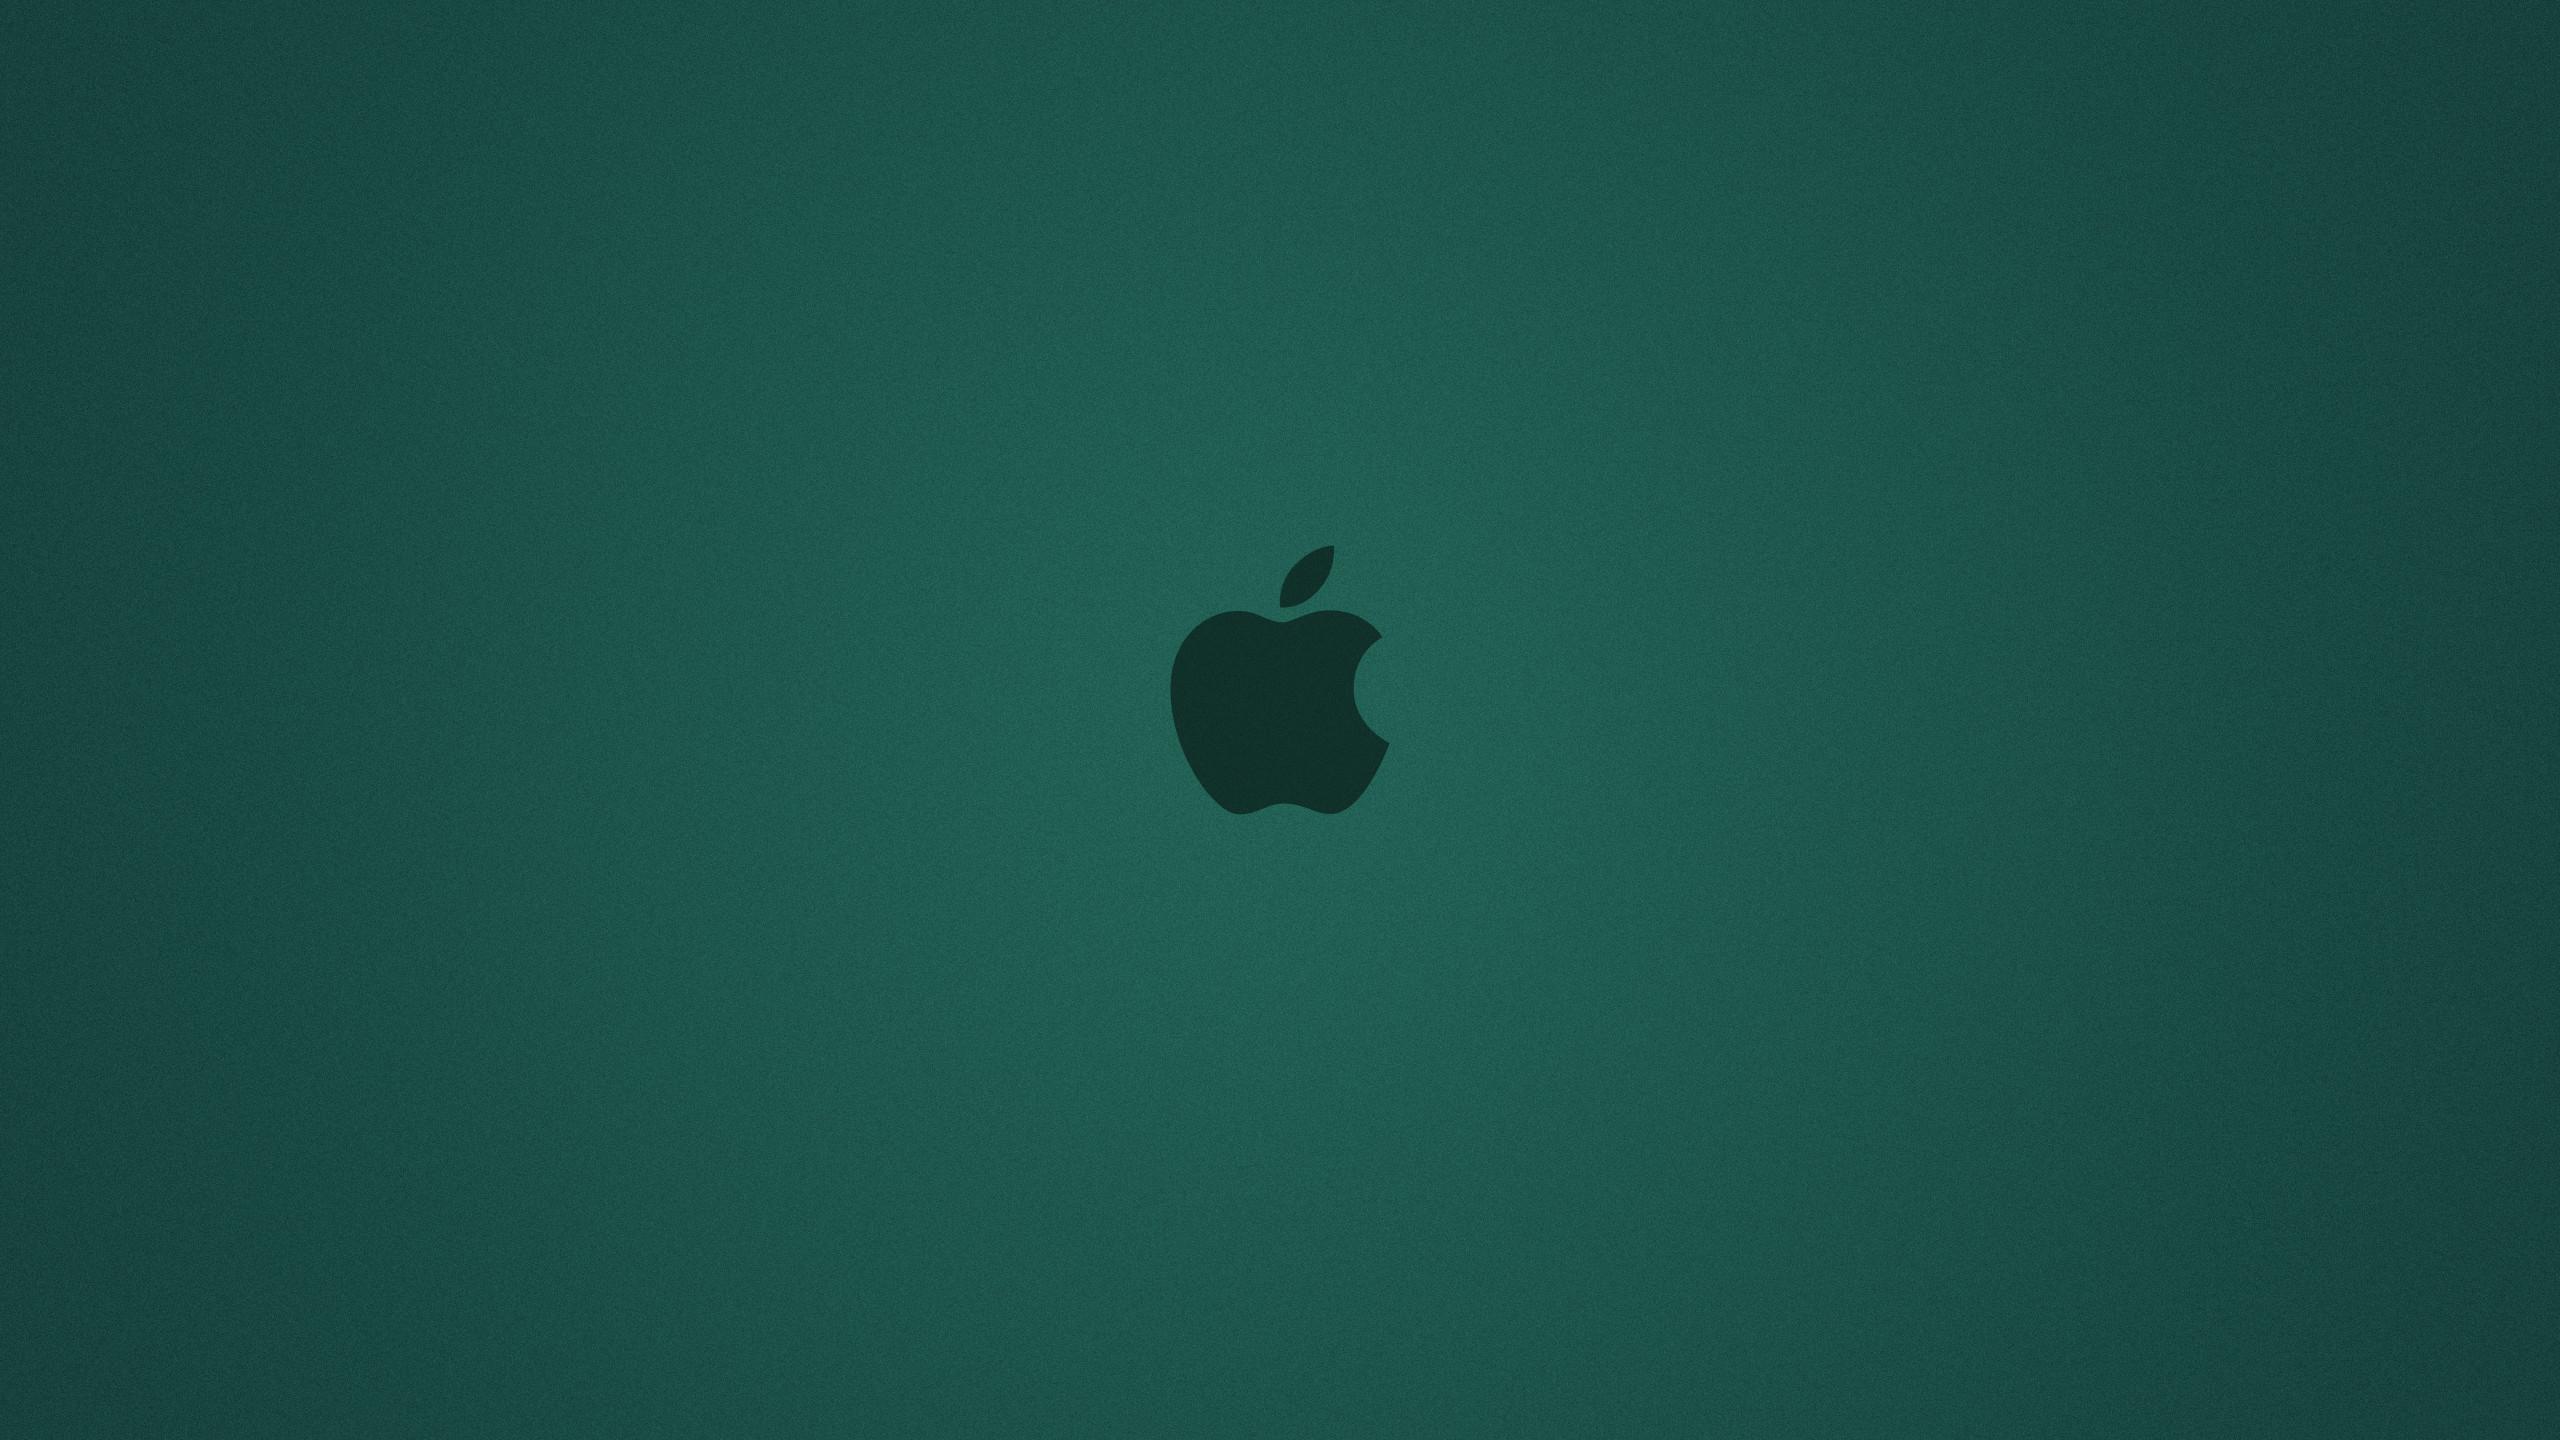 Cyan Apple Background desktop PC and Mac wallpaper